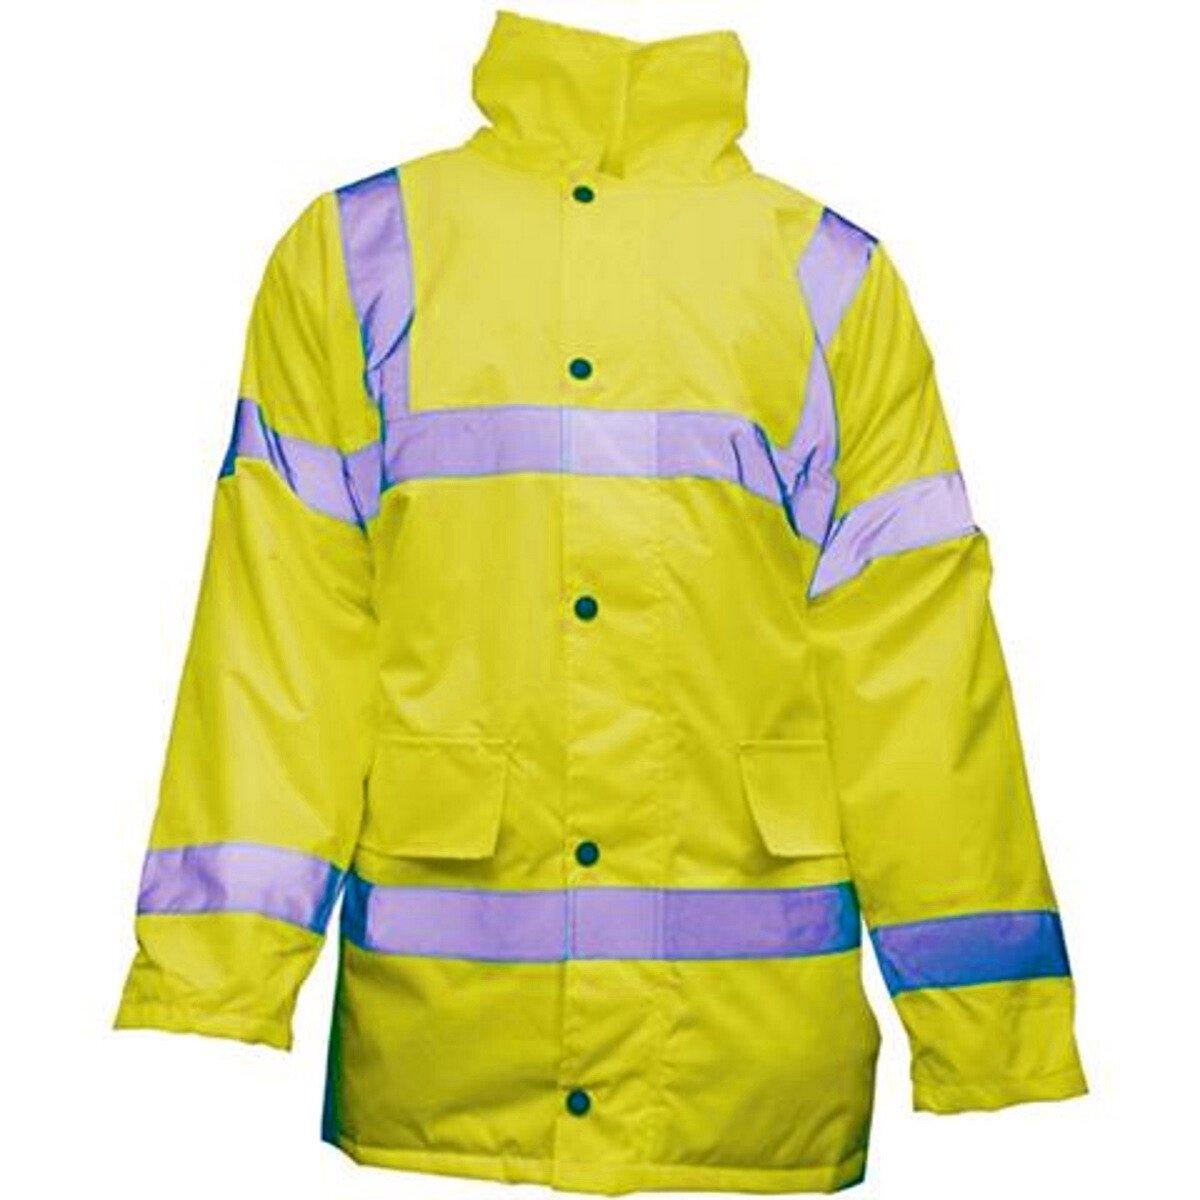 JSP F-HVMWJ-YLW-M Hi-Vis Motorway Jacket - Yellow - Medium